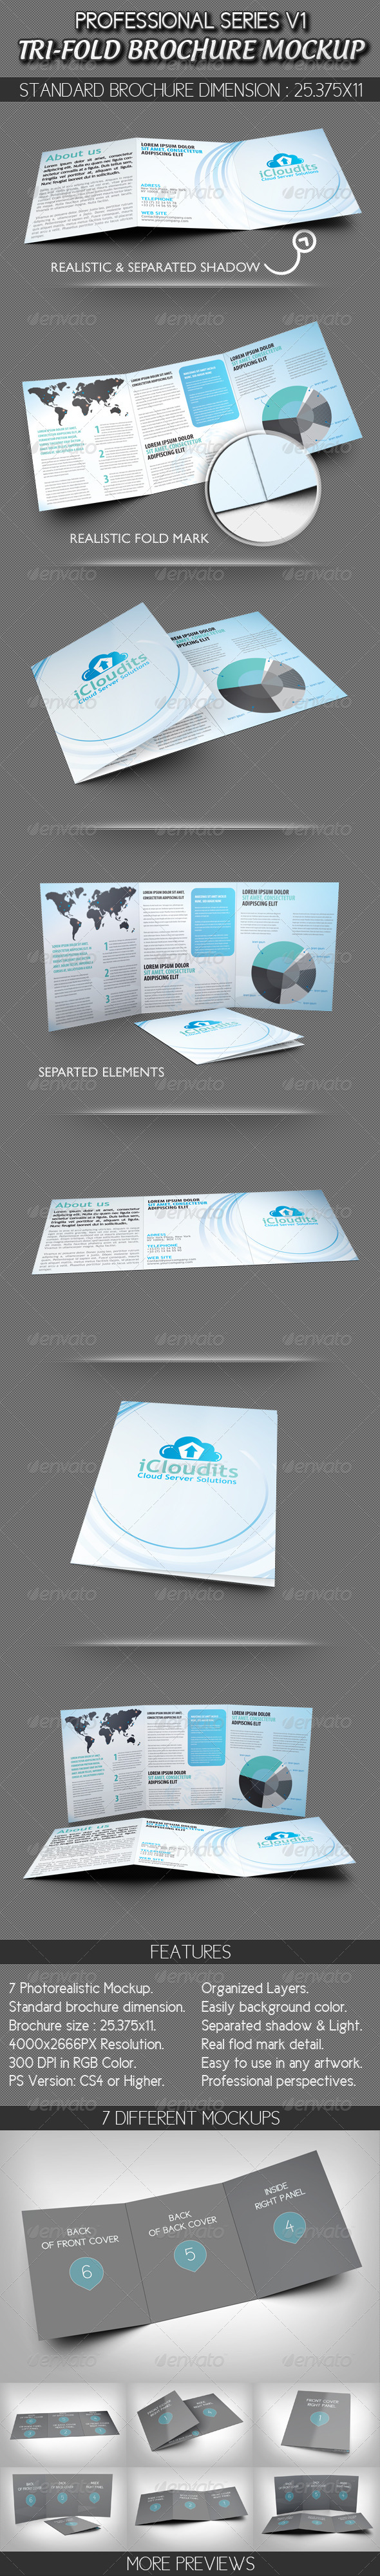 Professional Tri-fold Brochure Mockup V1